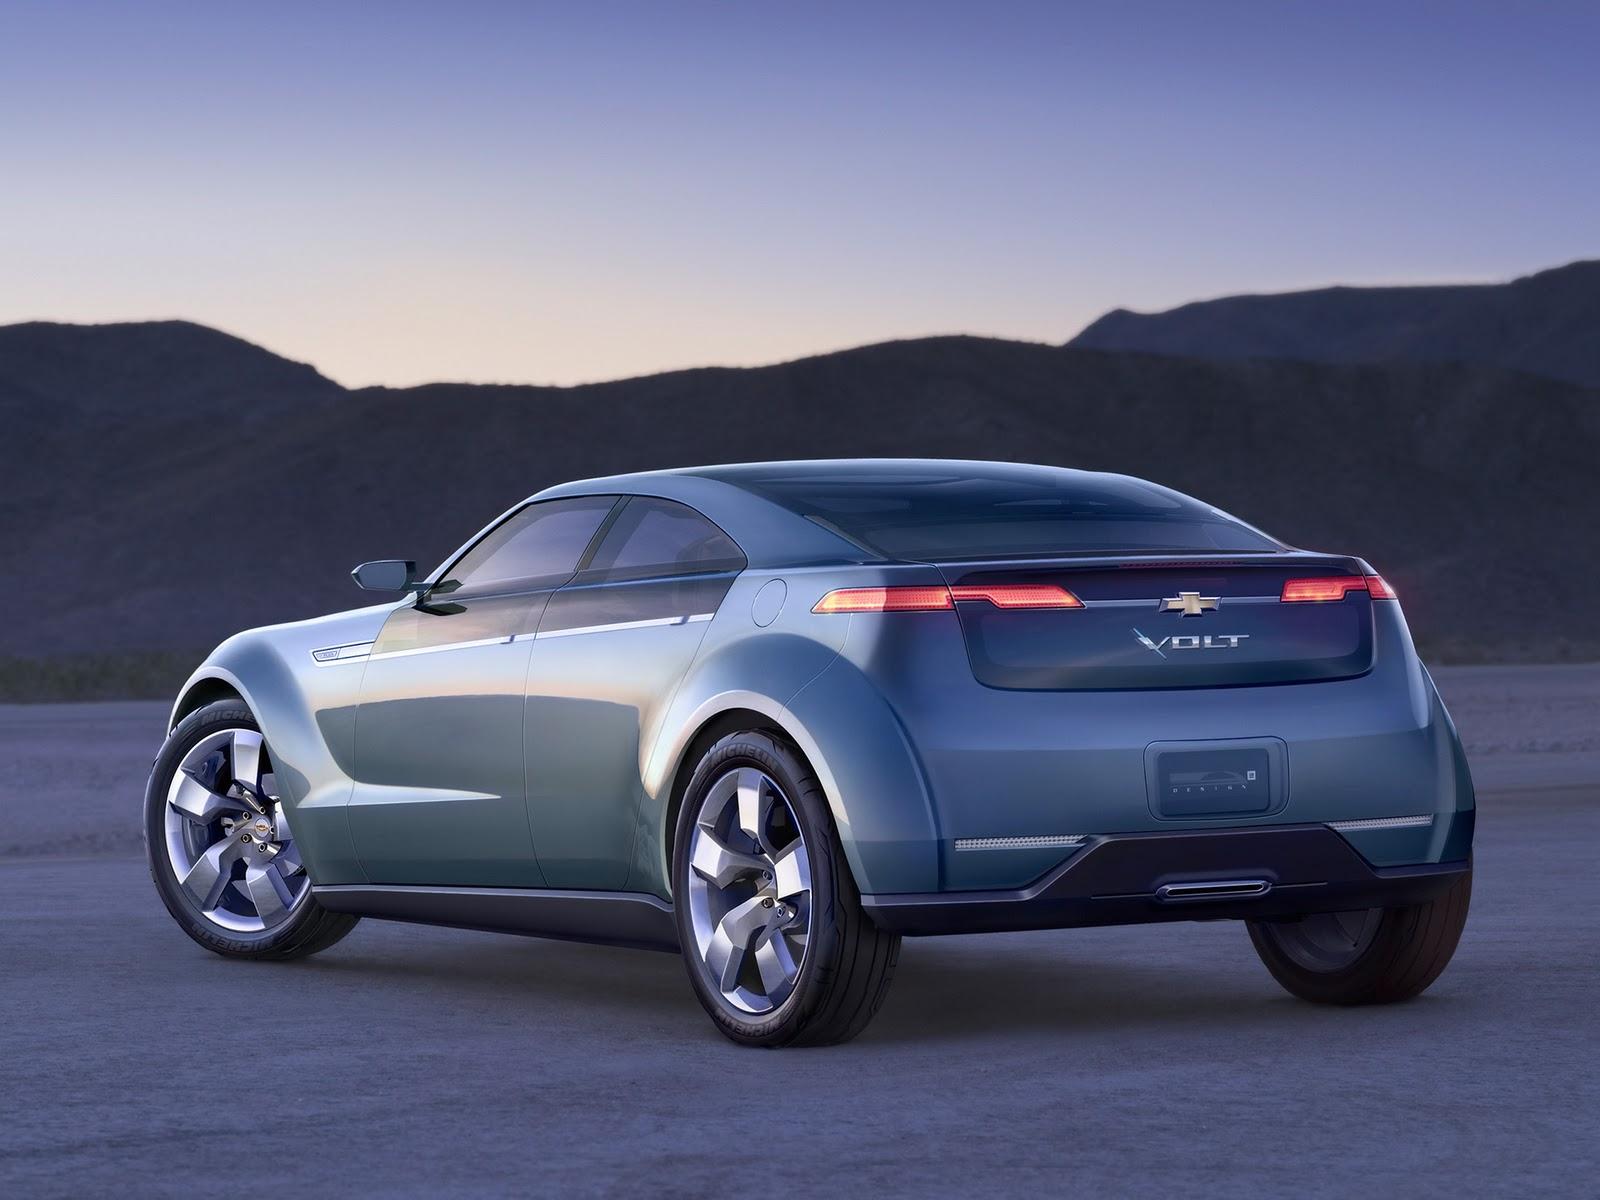 Chevrolet Volt Concept Hybrid Electric Car Automobile For Life